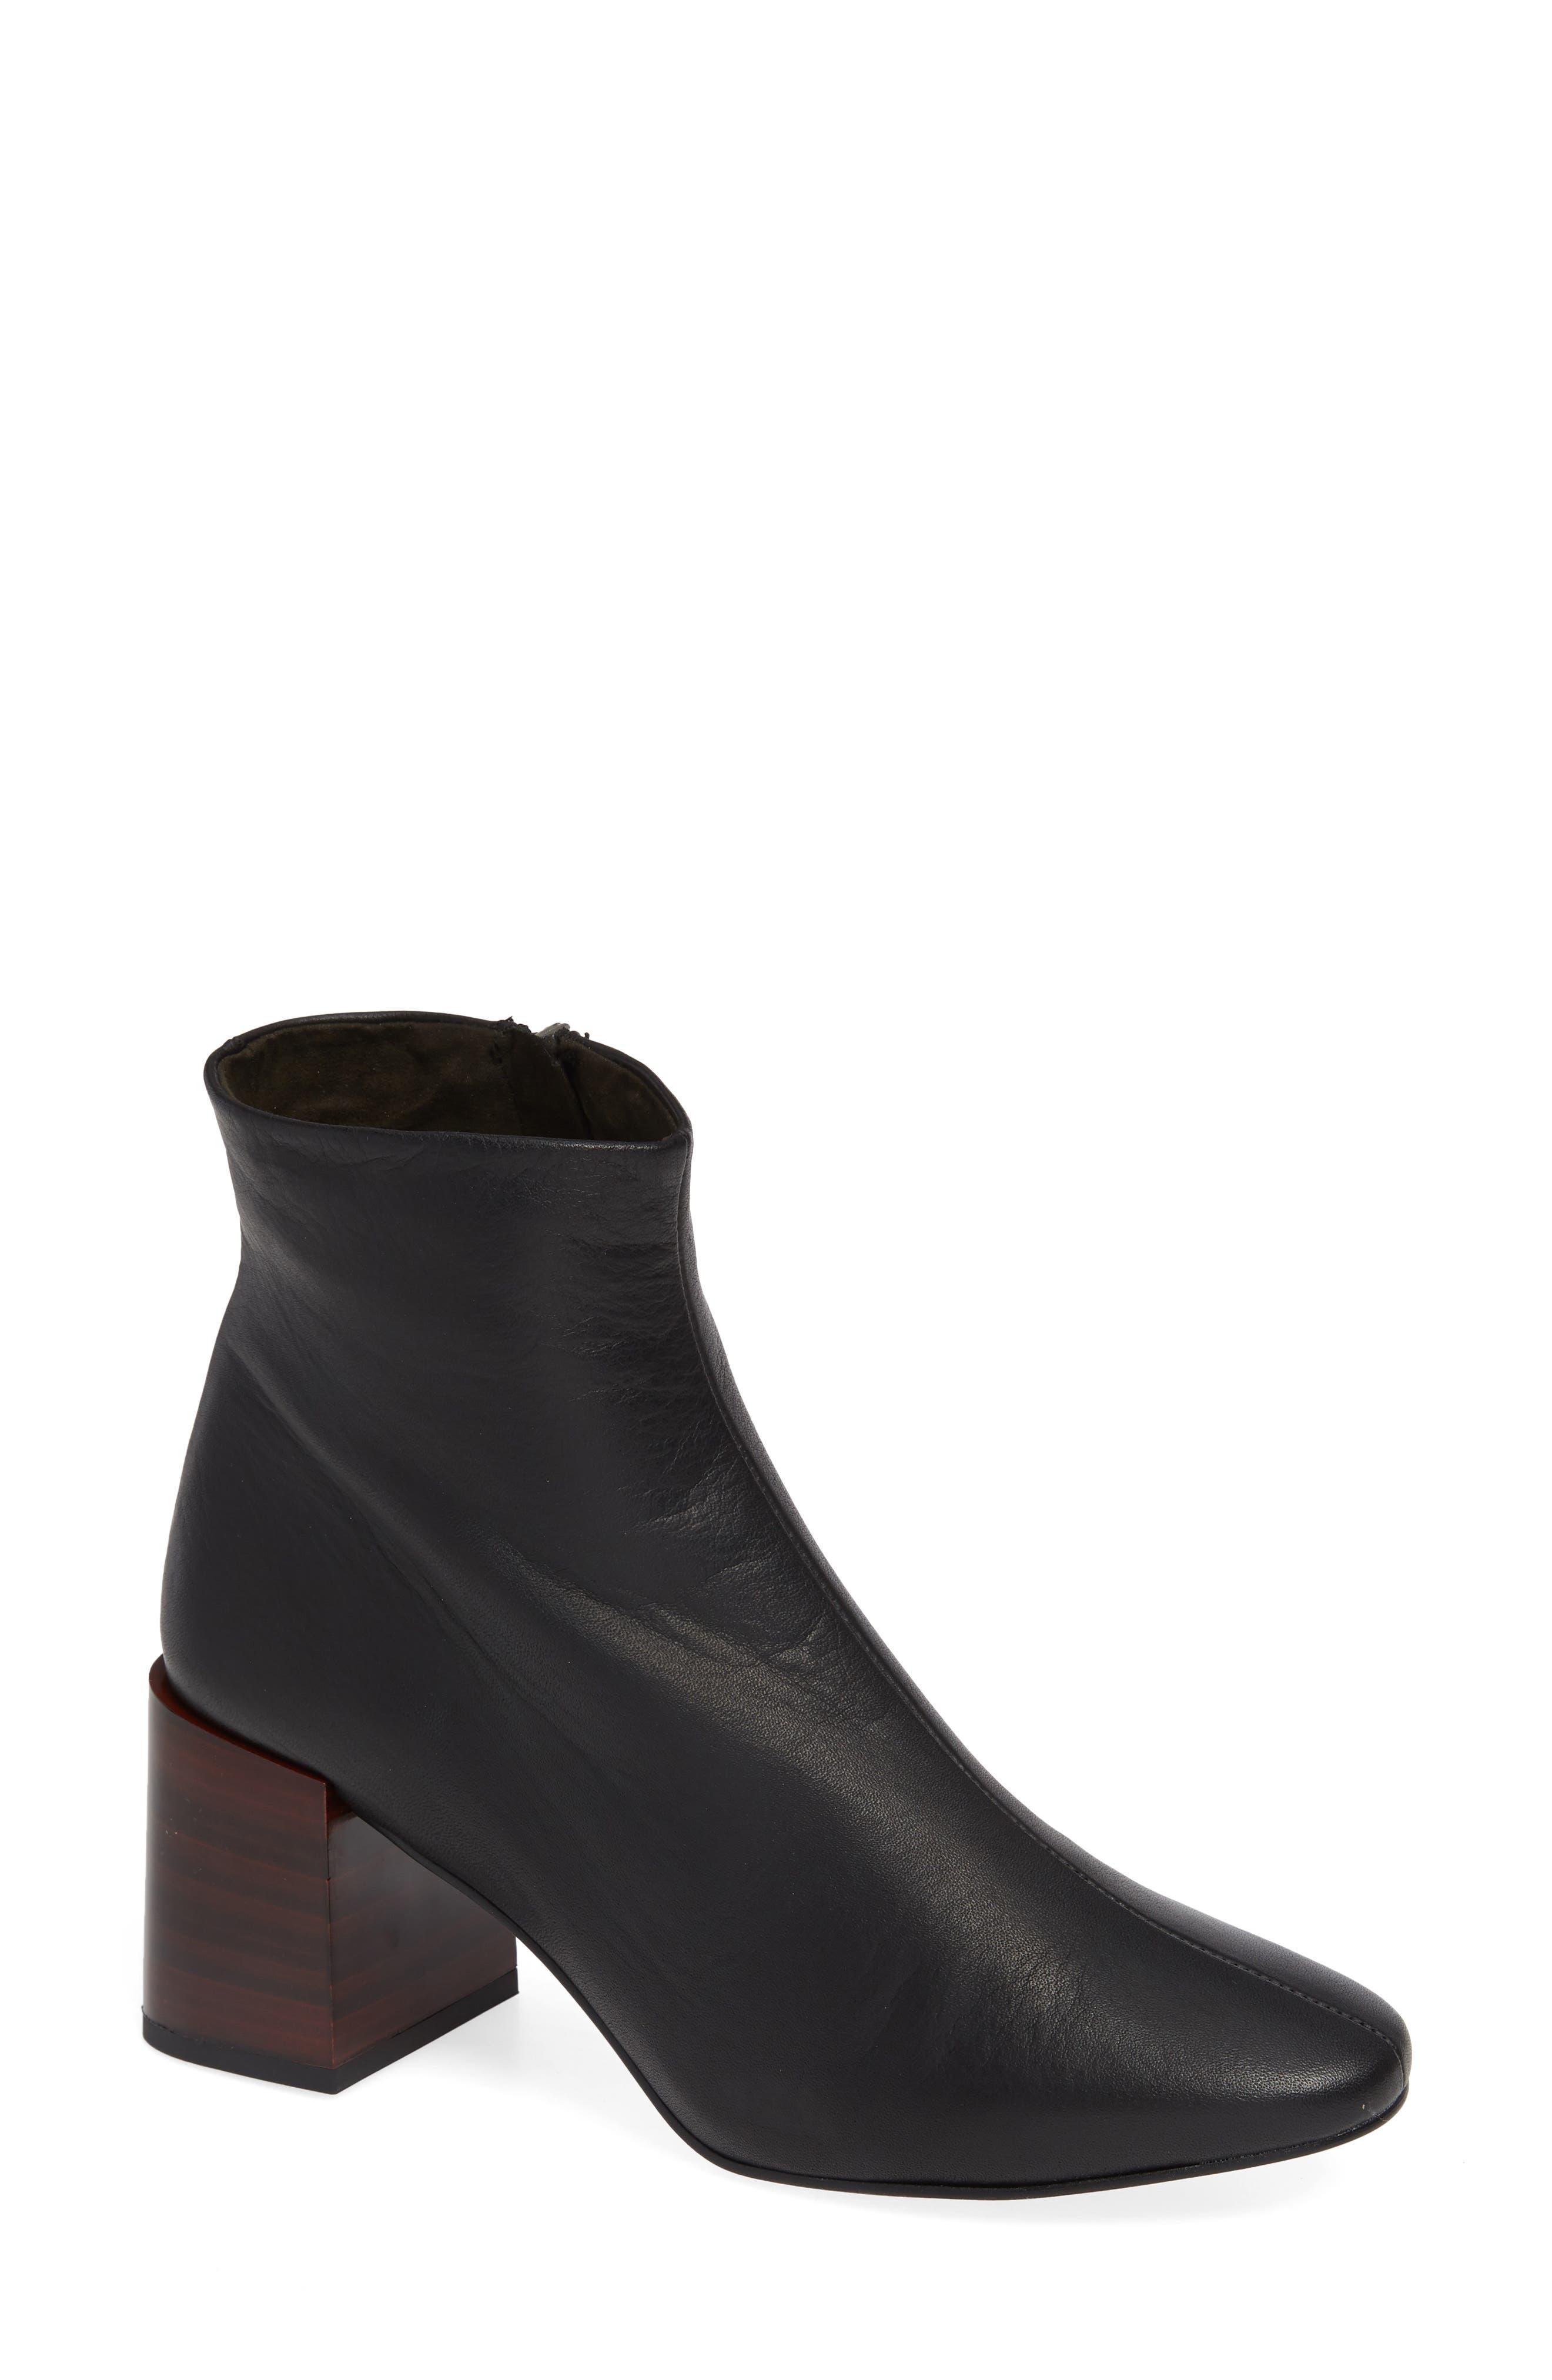 Topshop Womens Shoes Nordstrom Cut Engineer Crocodile Safety Steel Genuine Leather Brown